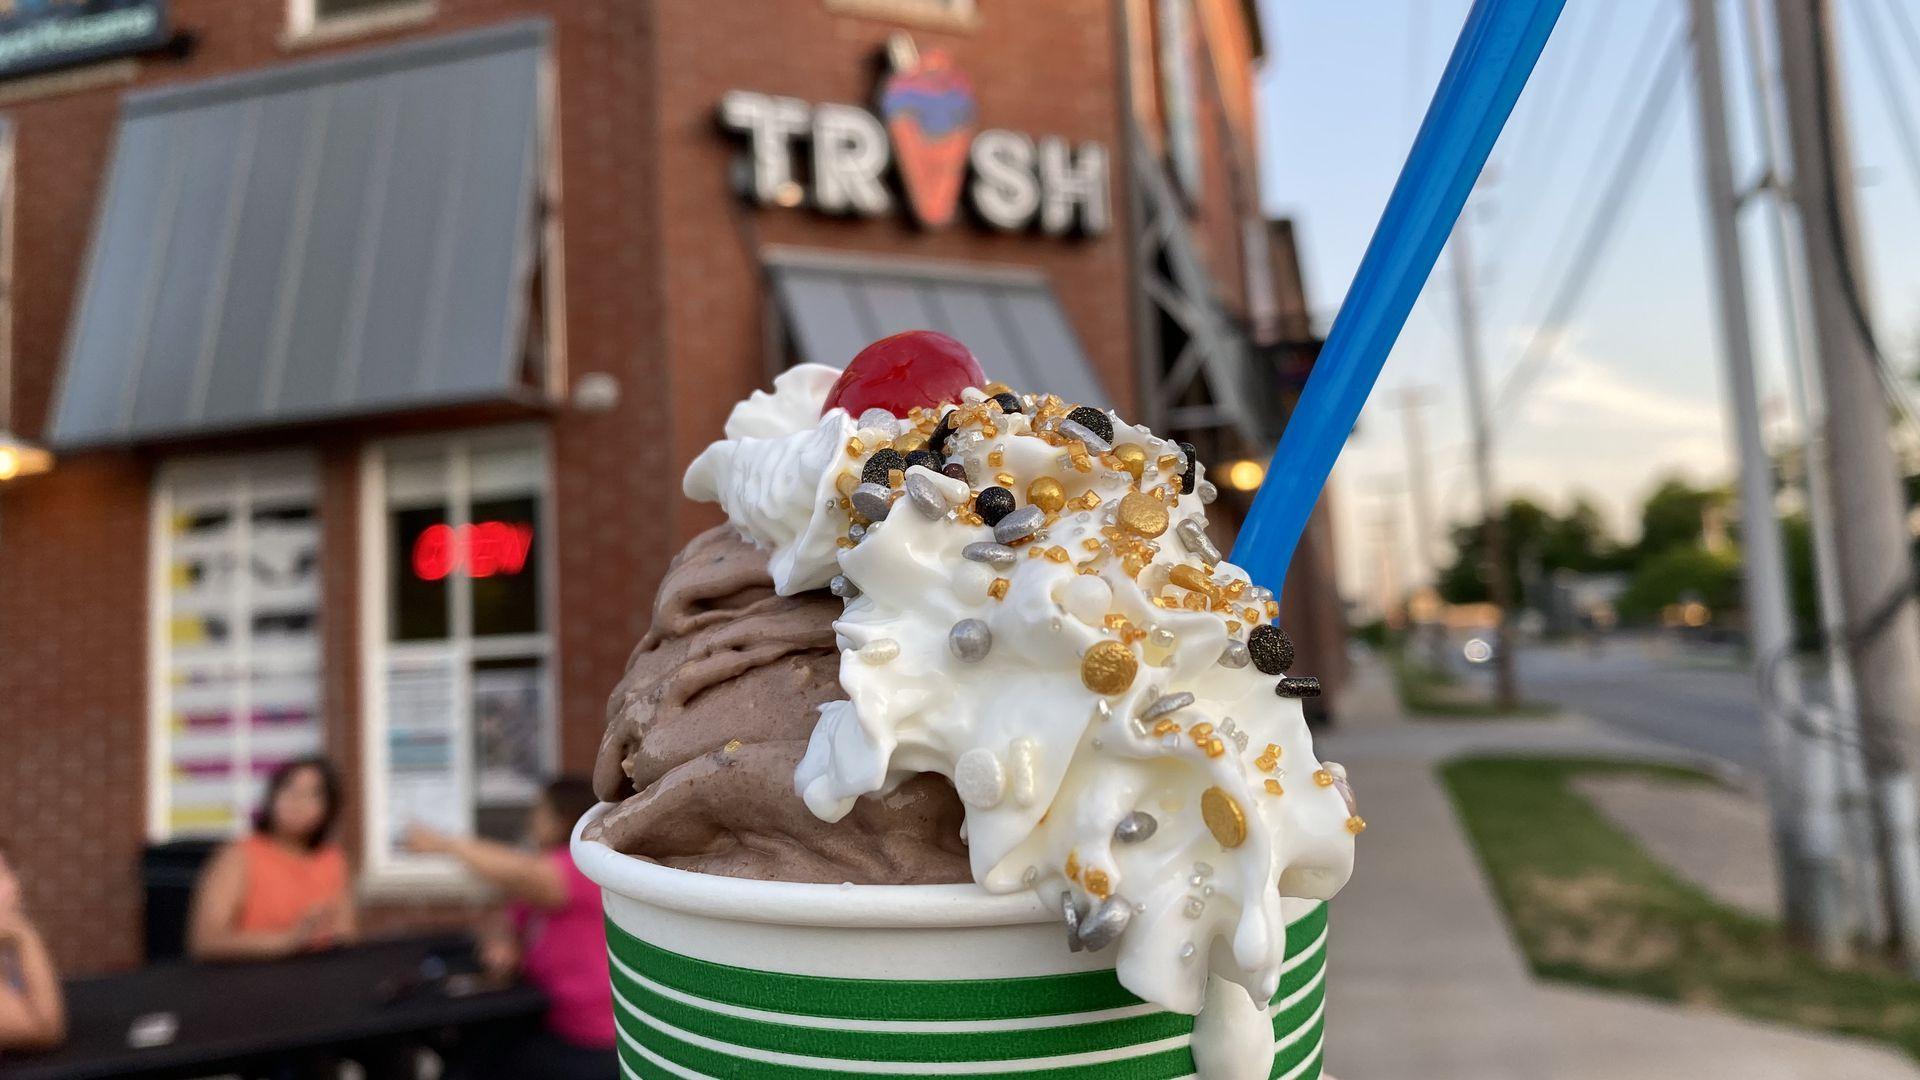 An ice cream sundae with whipped cream on top